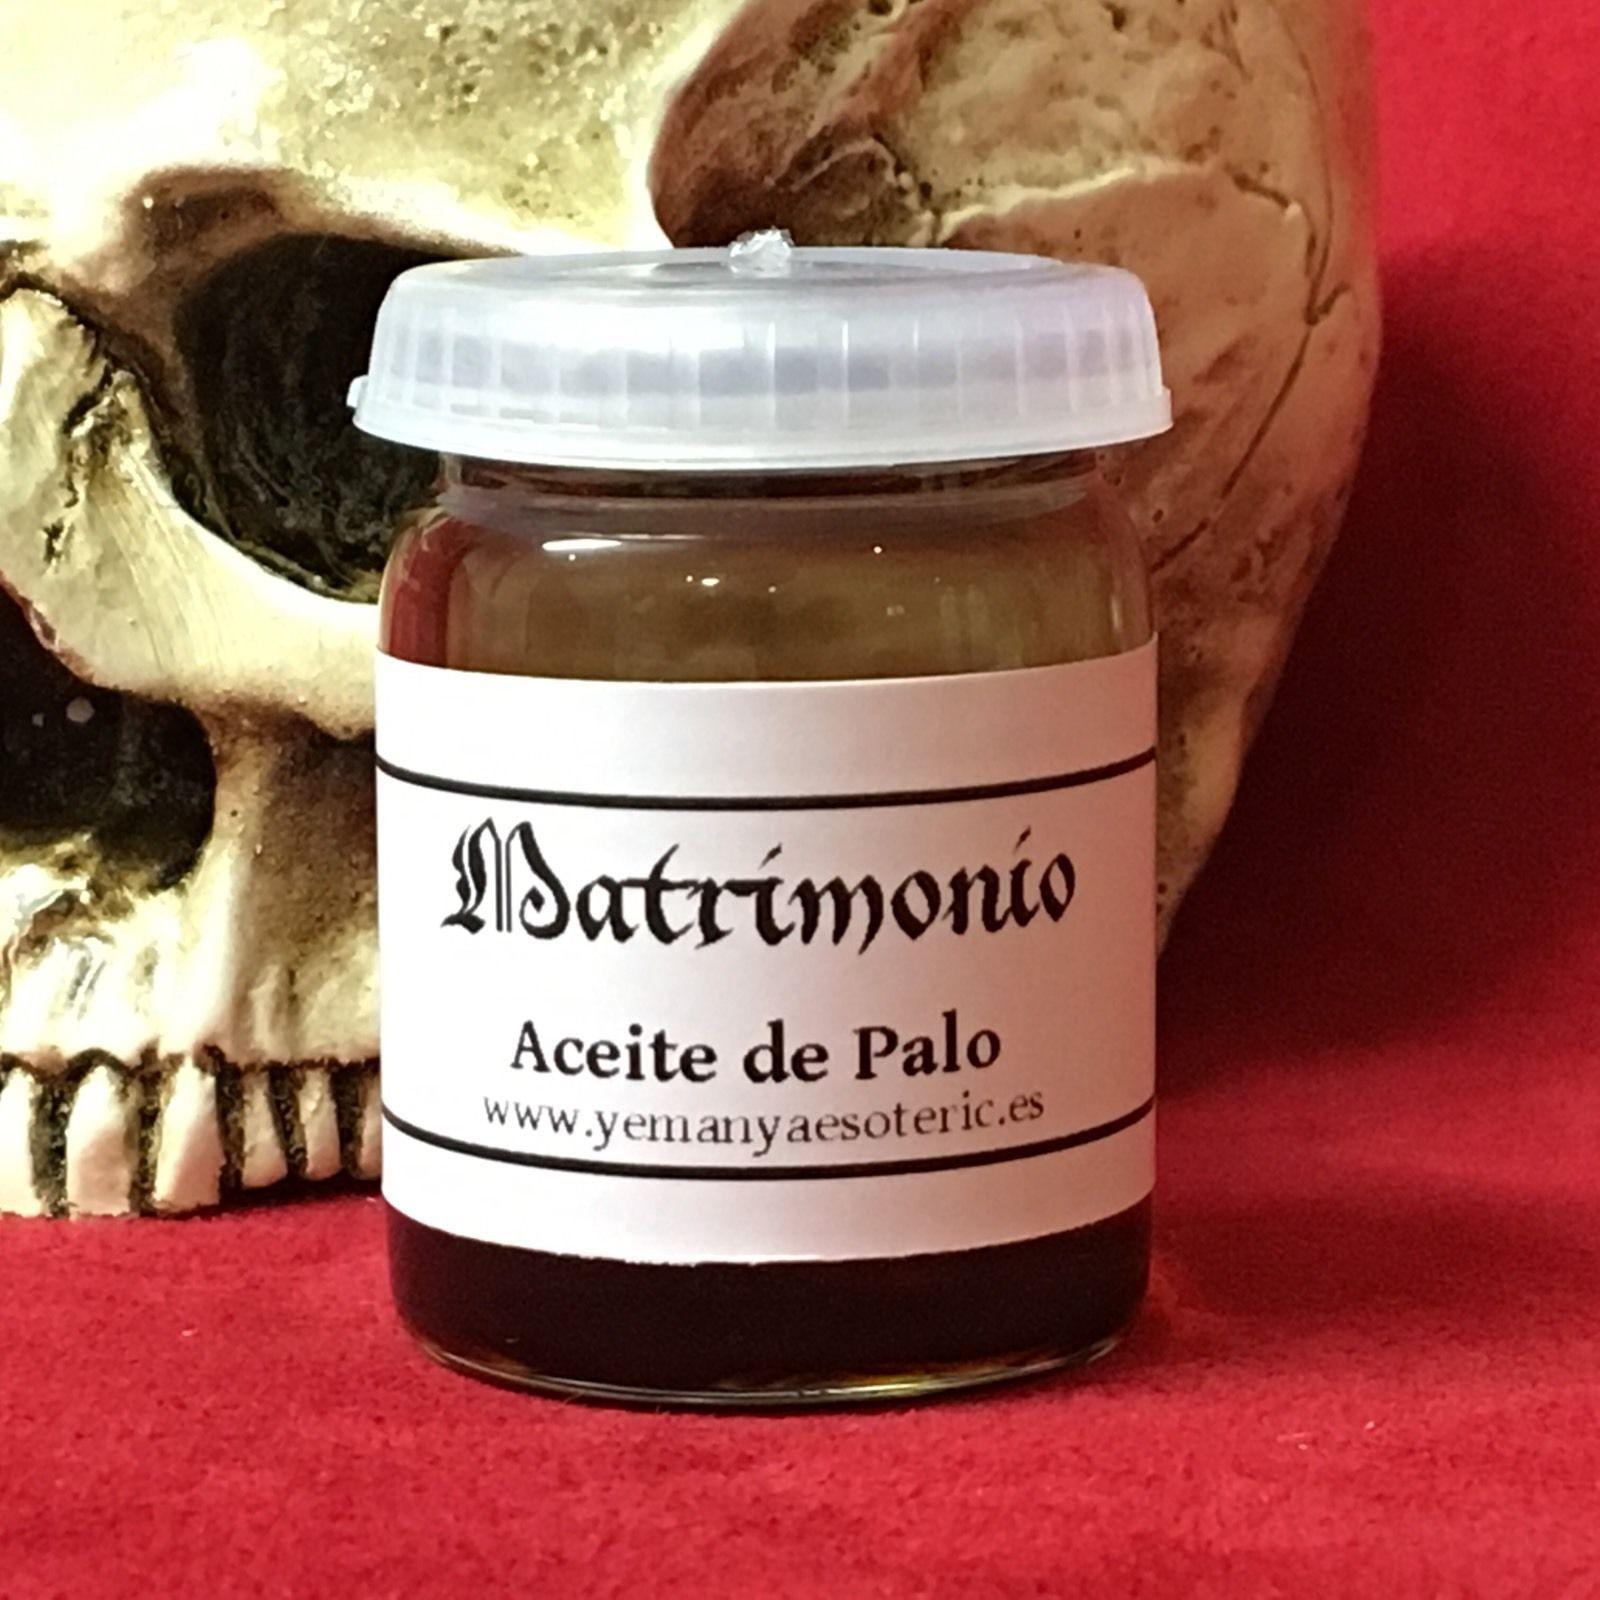 ☆ ACEITE ESOTERICO DE PALO MATRIMONIO ☆ RITUAL OIL ☆ 15ml.